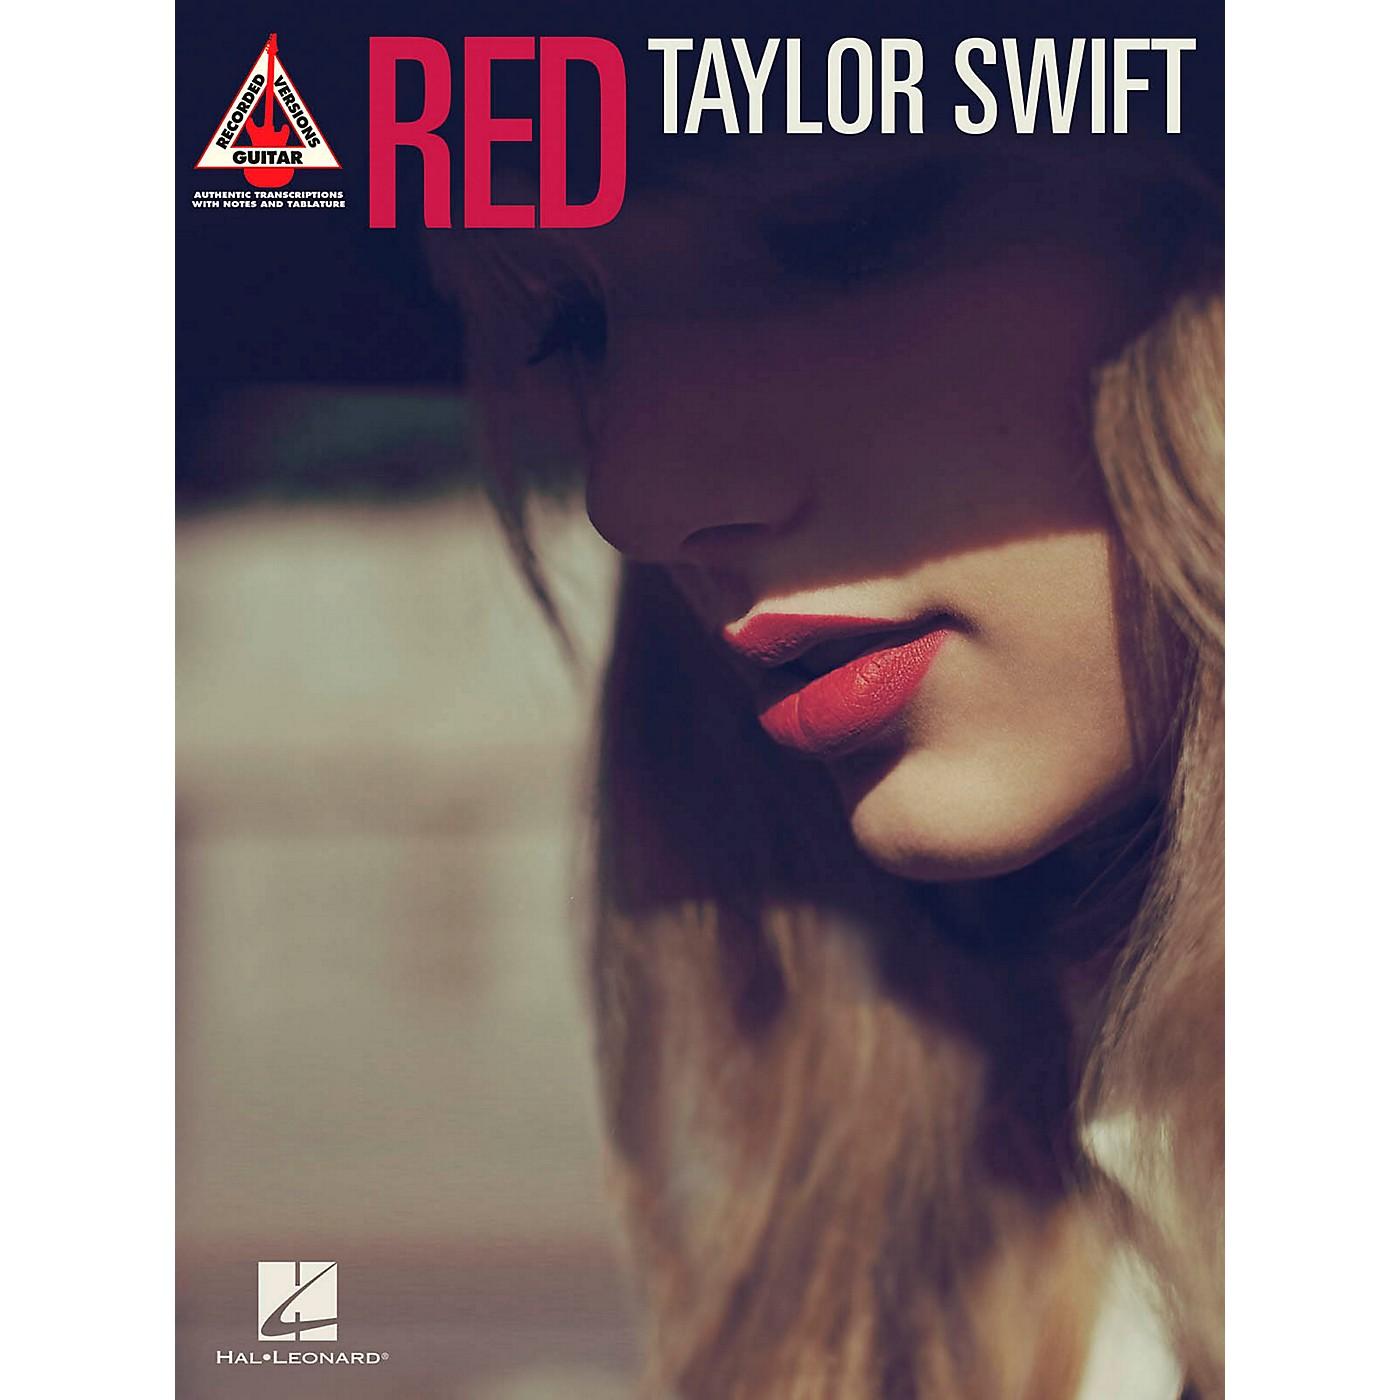 Hal Leonard Taylor Swift  Red Guitar Tablature Songbook thumbnail